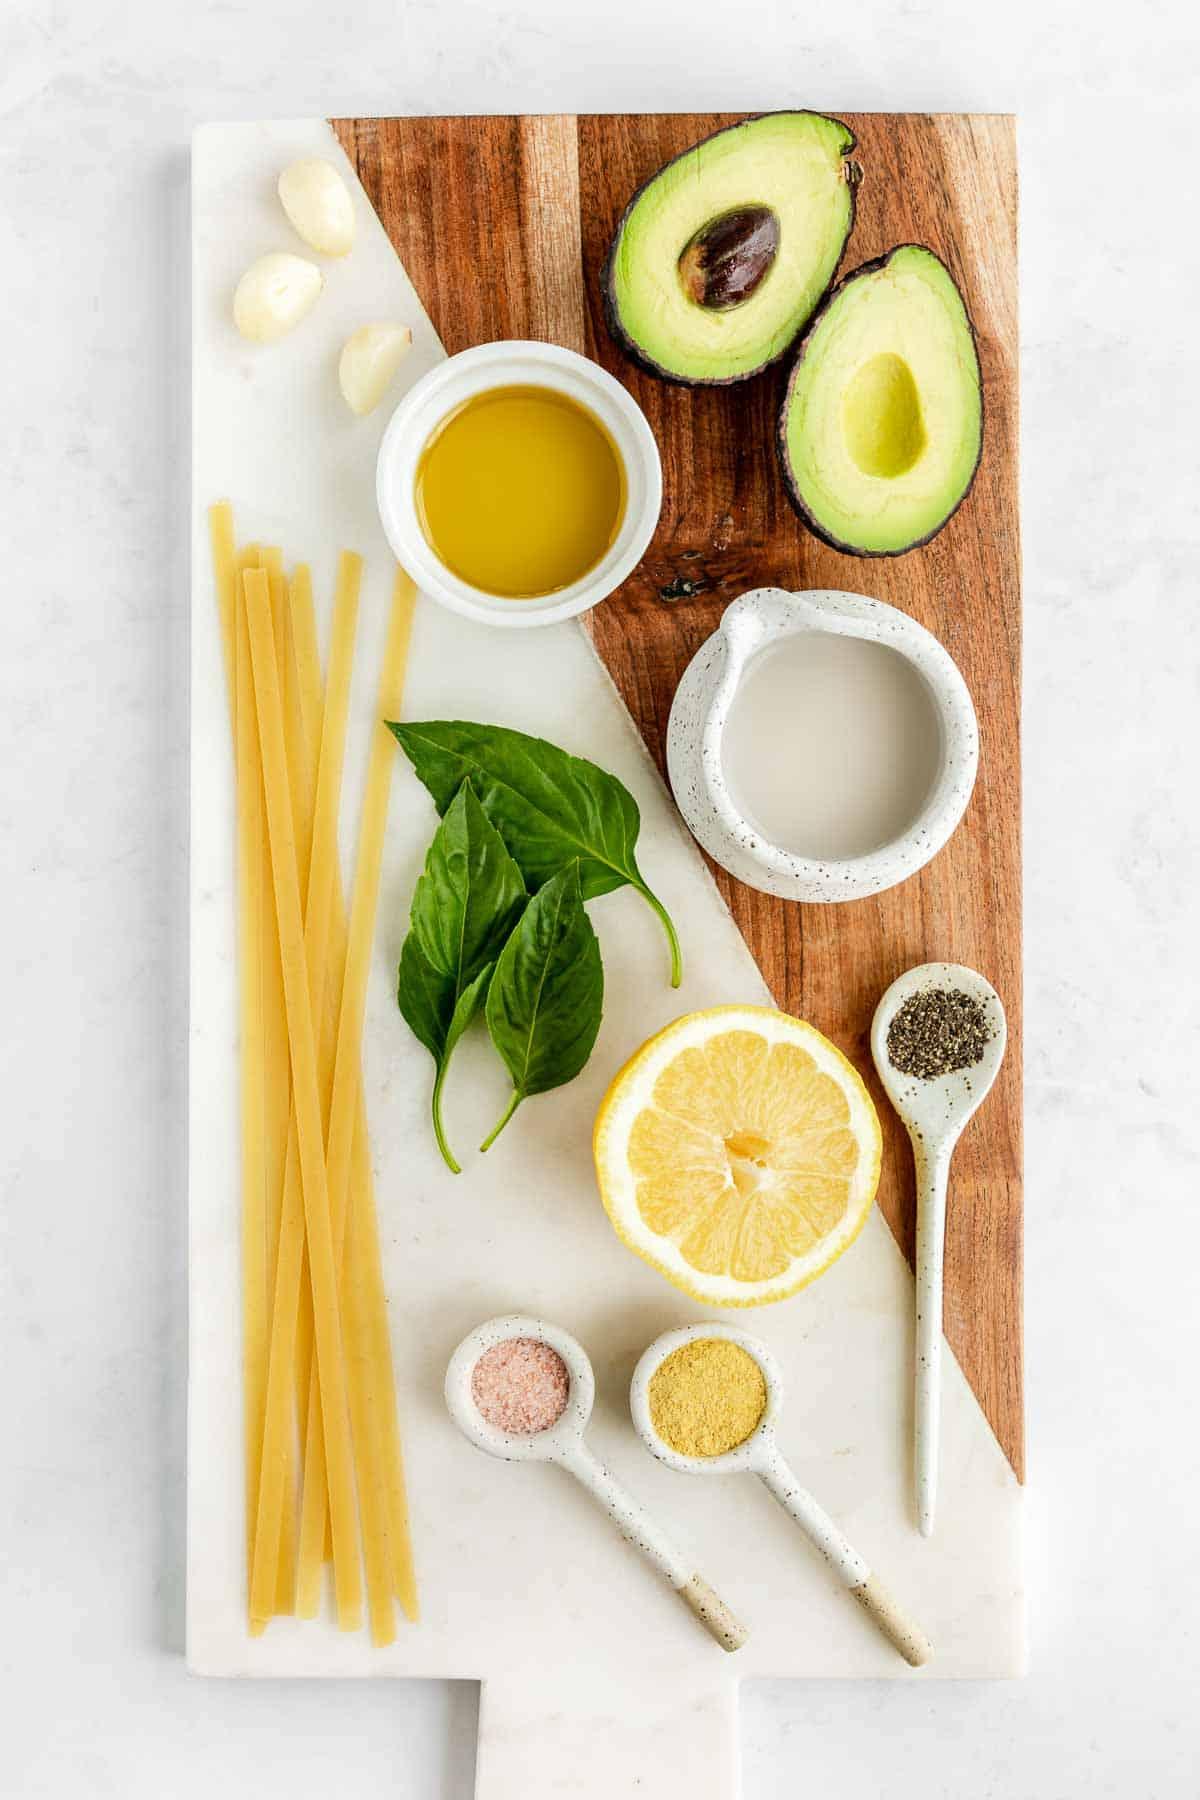 avocado, basil, garlic, olive oil, nutritional yeast, lemon juice, salt, pepper, and plant-based milk on a marble board